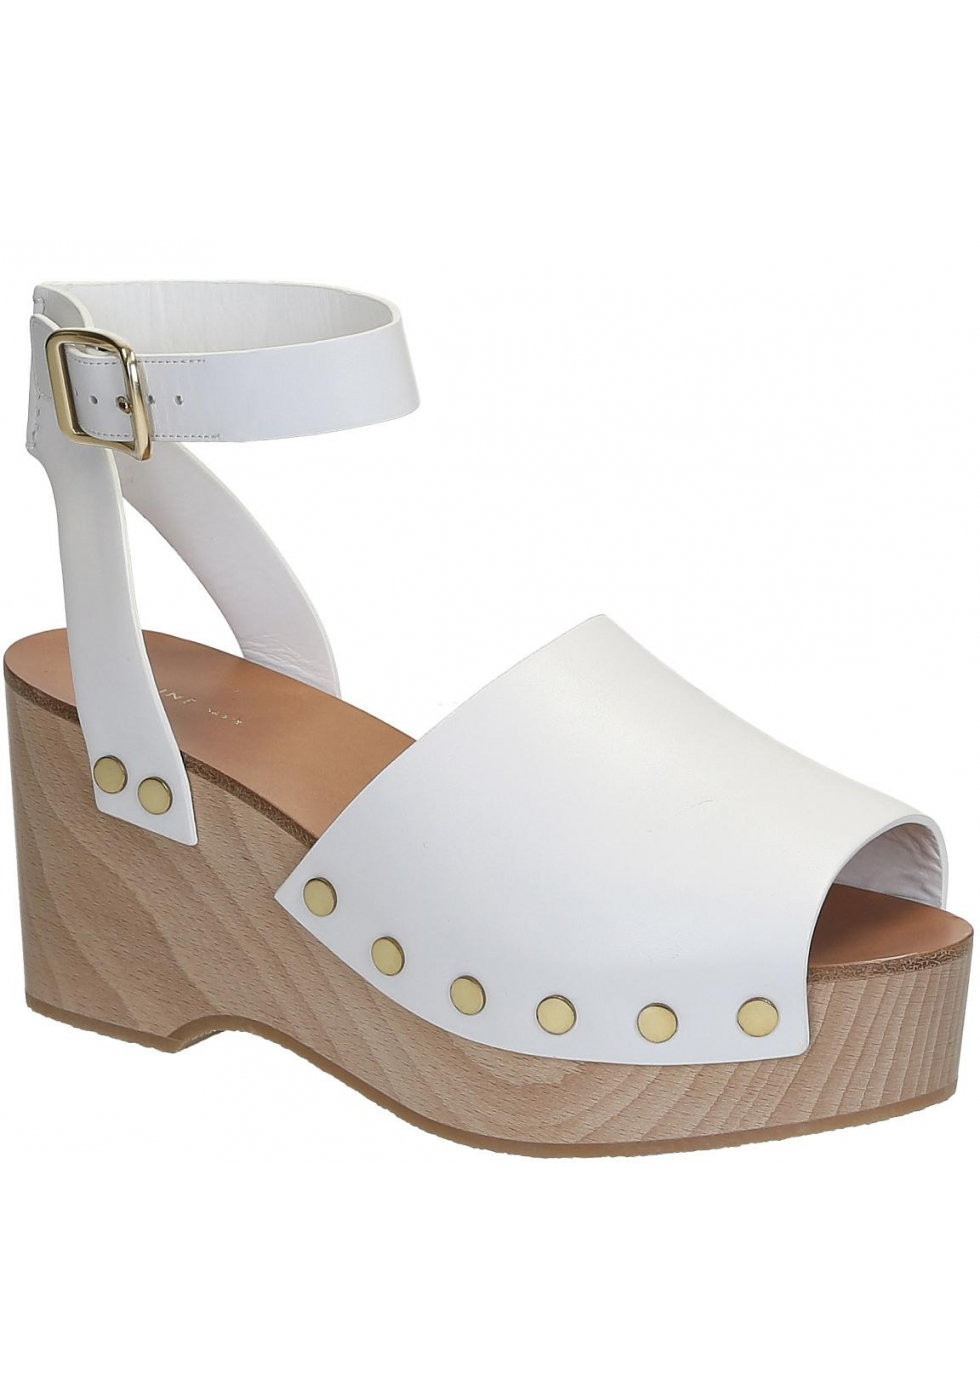 4b3a1bf2a8e Céline wedges clogs sandals in white Calf leather